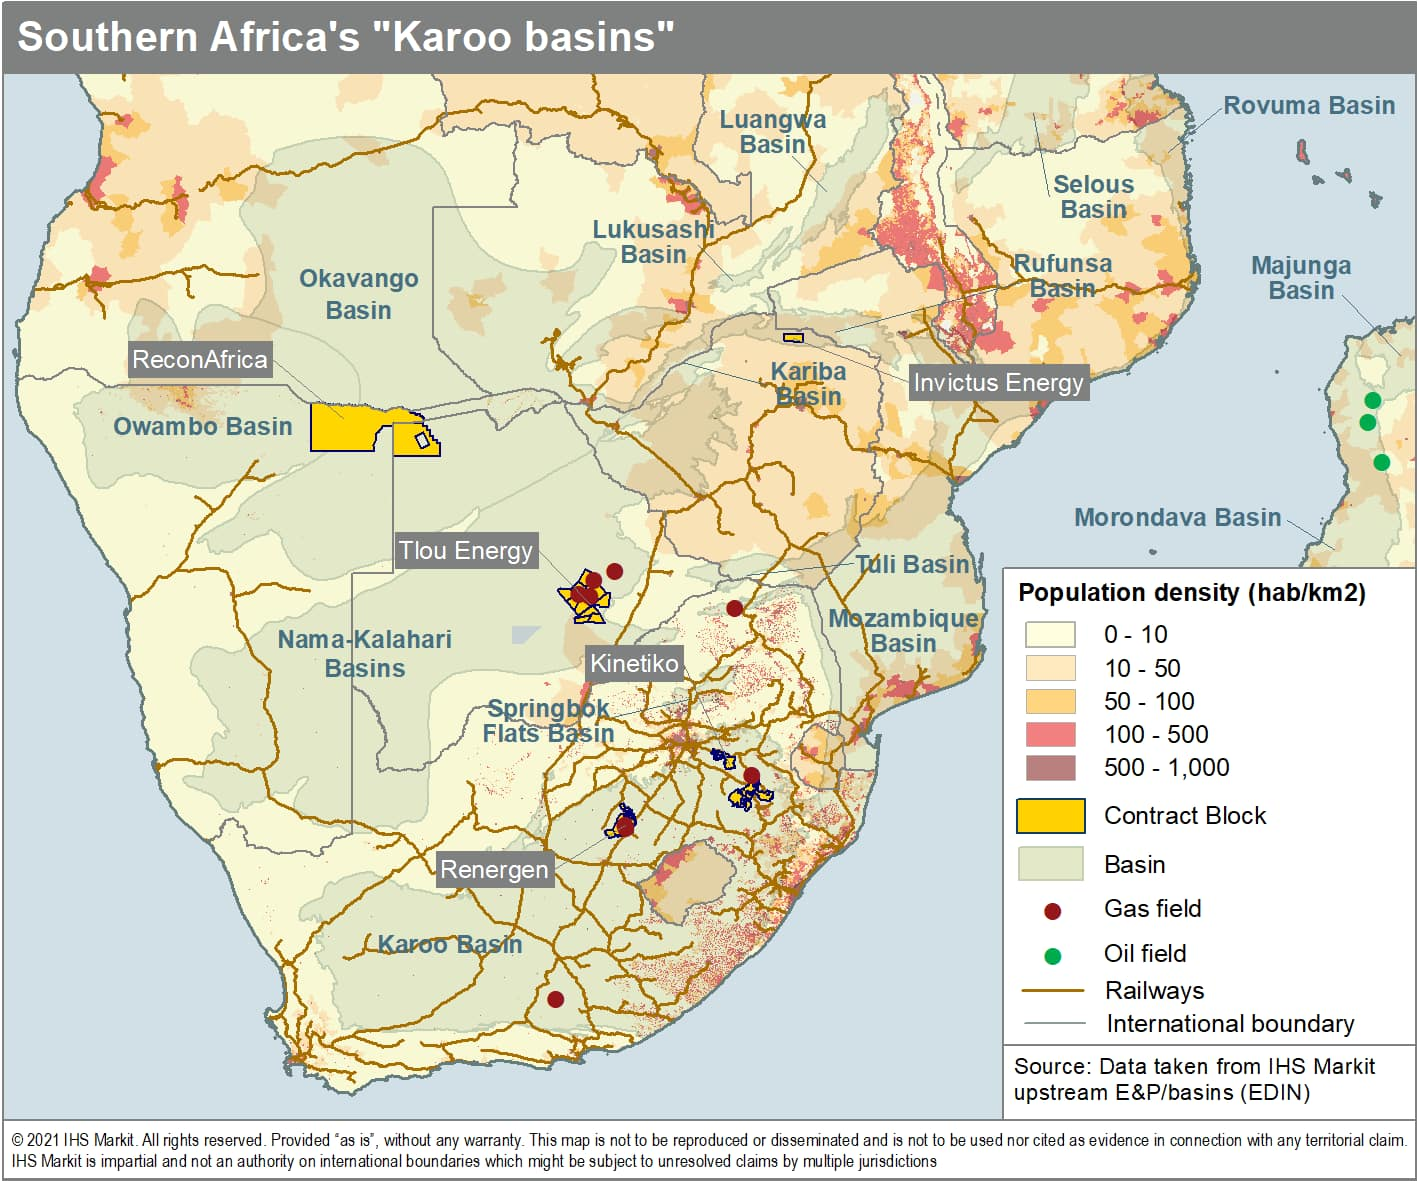 Southern Africa Karoo Basins